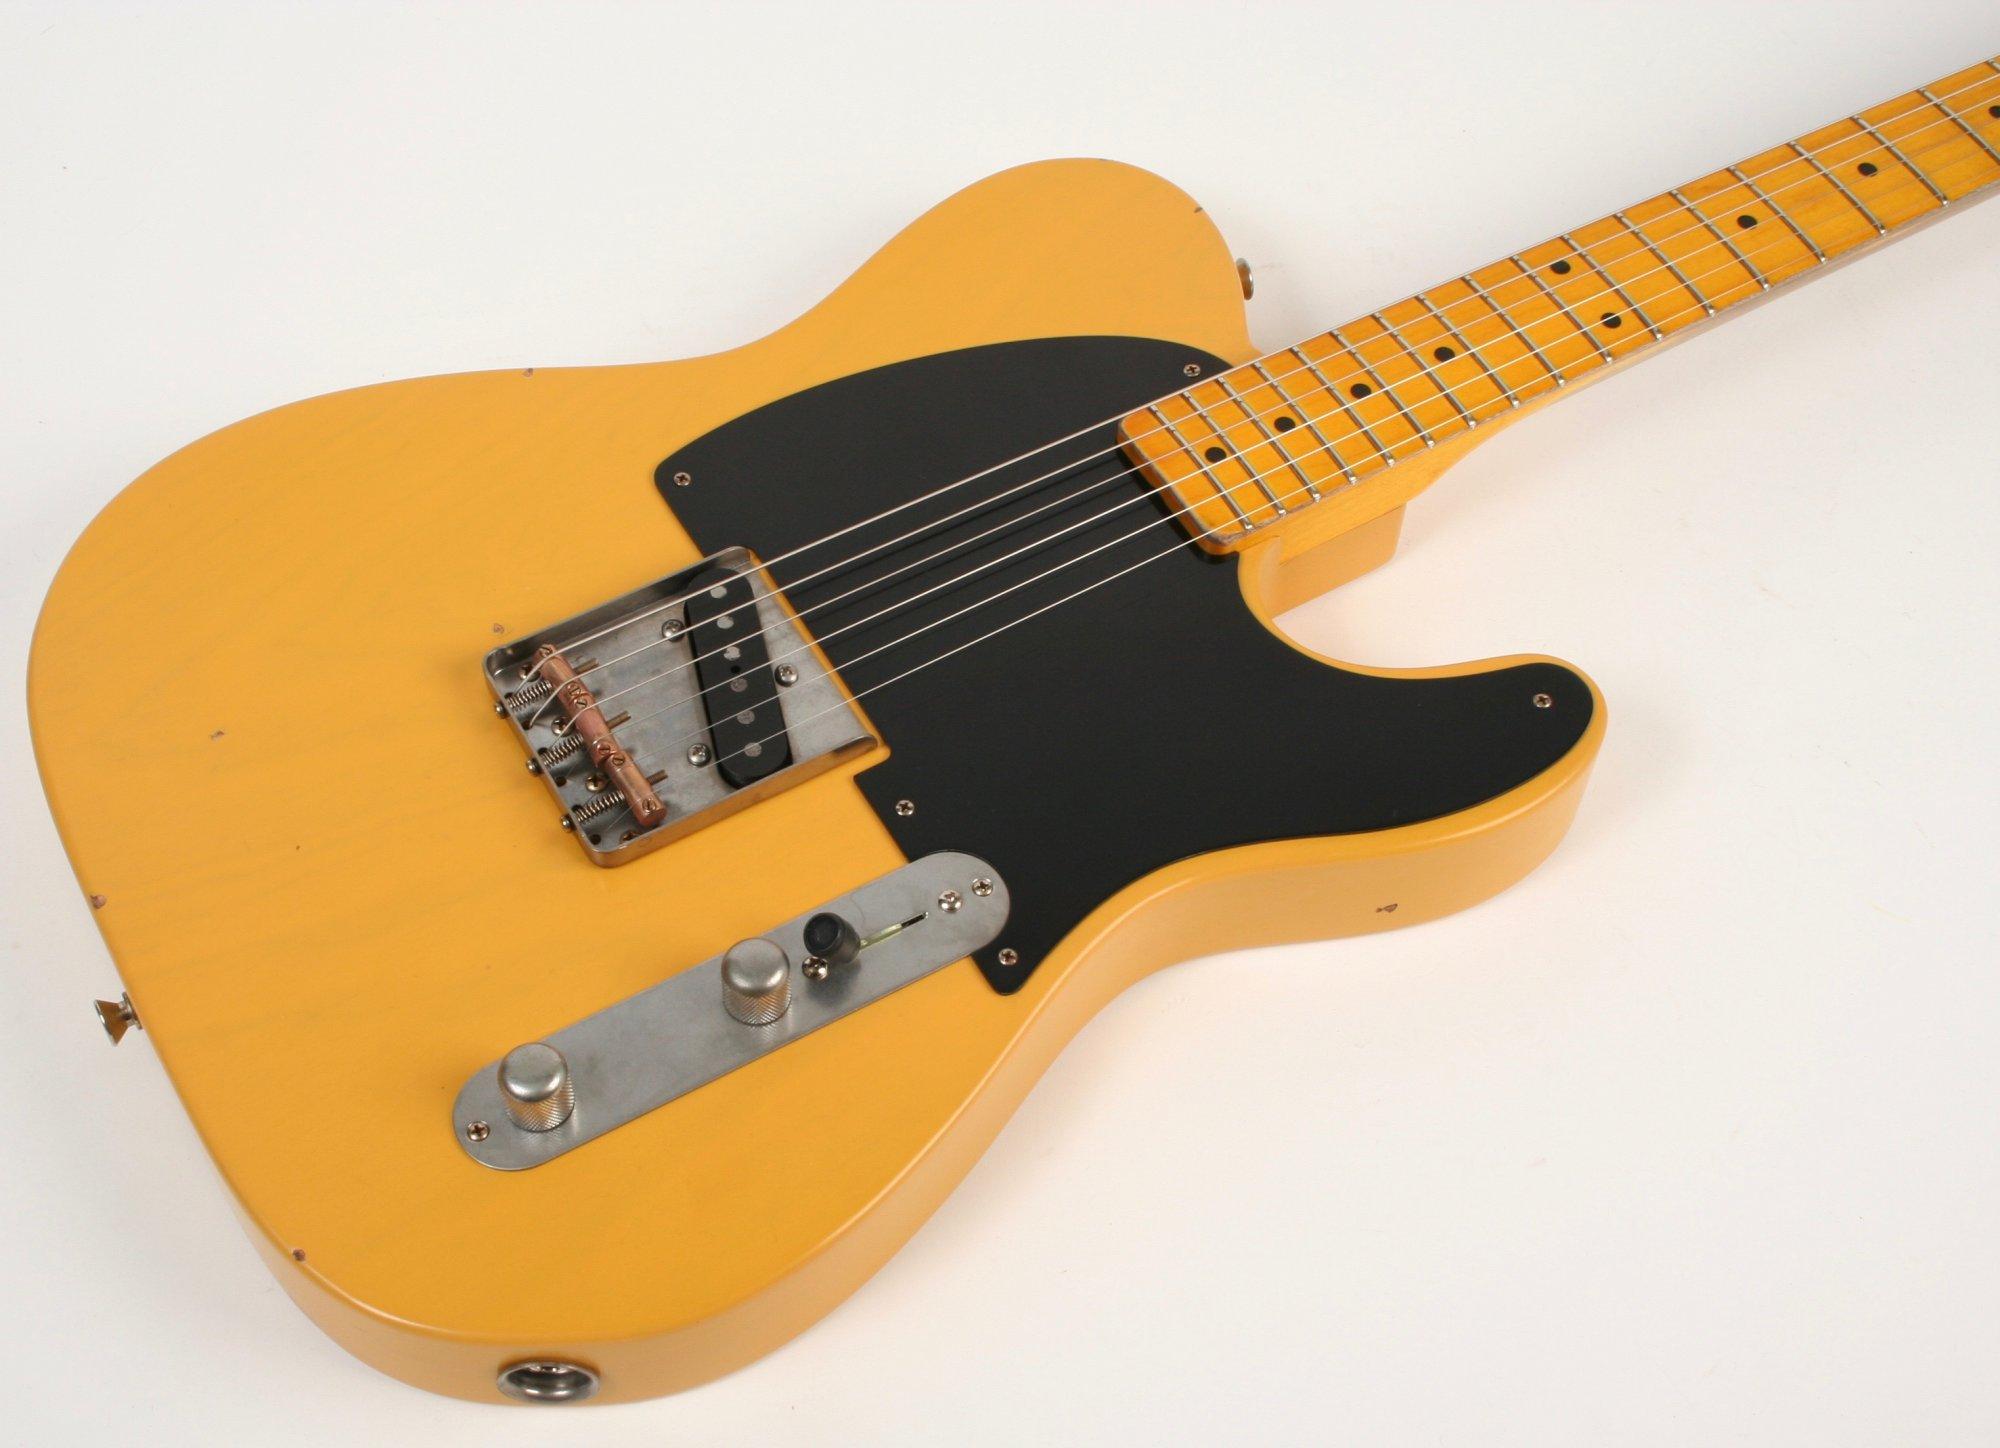 Nash Guitars E-52 Butterscotch Blonde